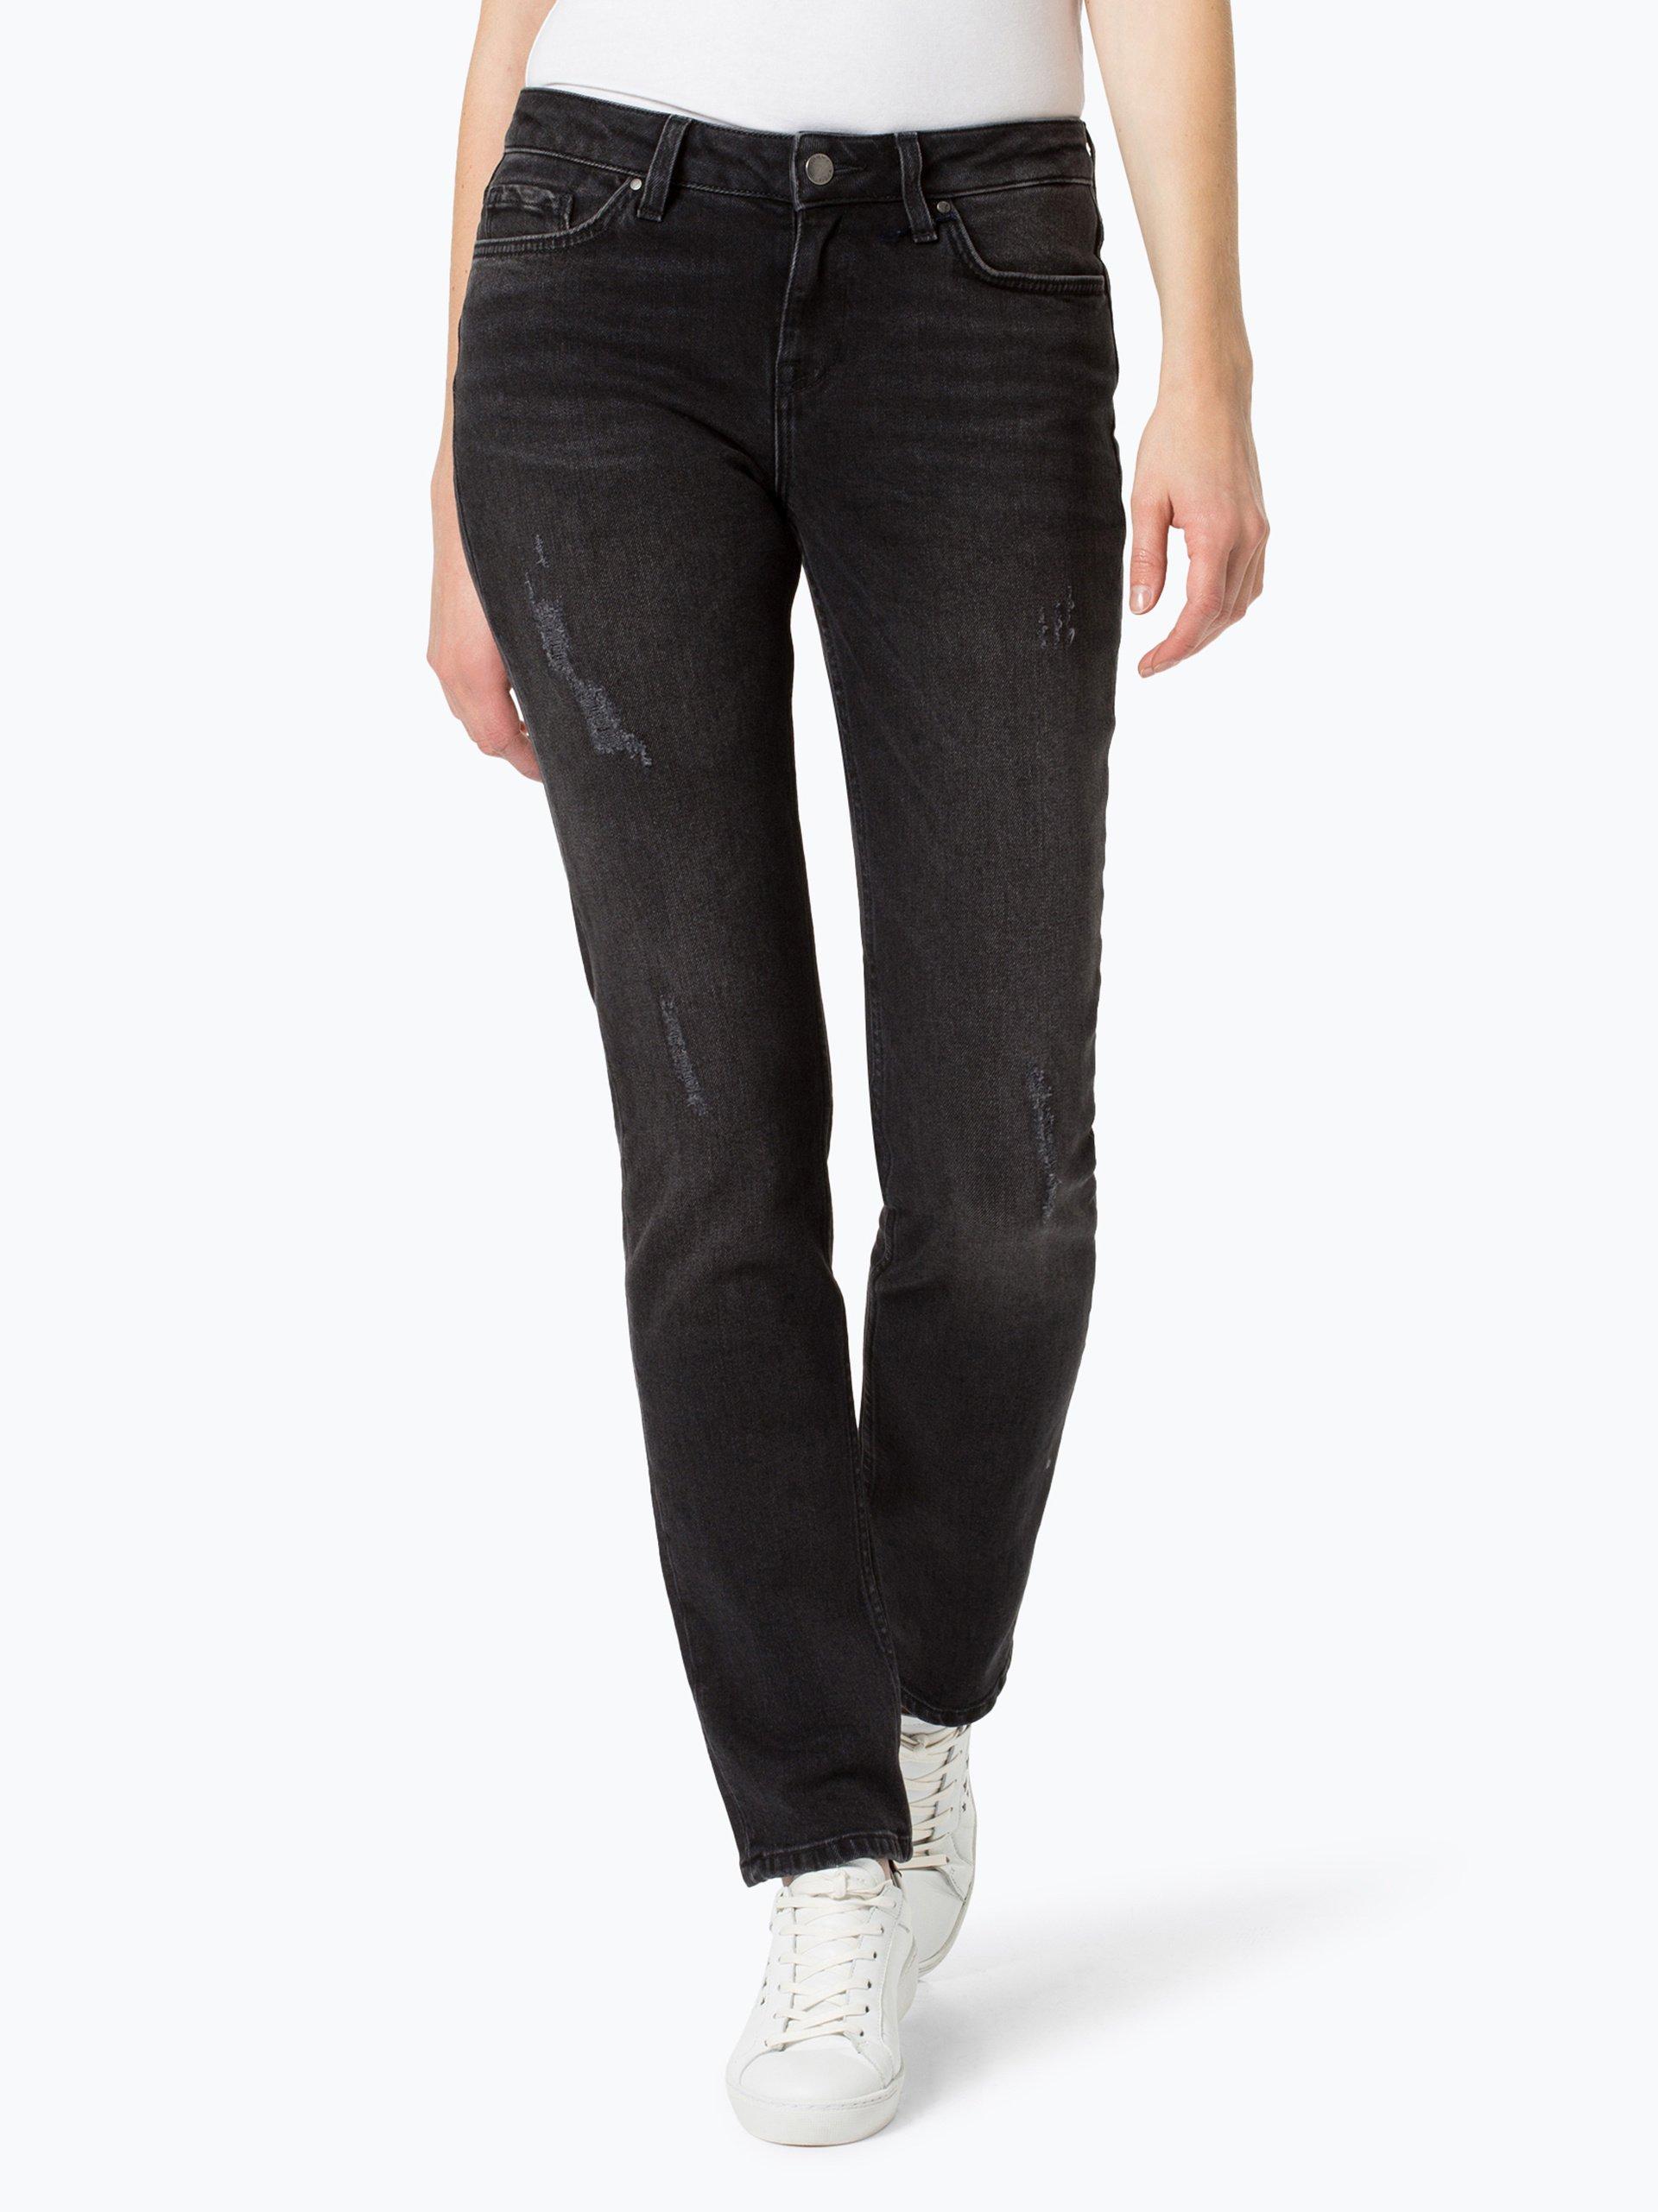 tommy hilfiger damen jeans rome online kaufen peek und. Black Bedroom Furniture Sets. Home Design Ideas